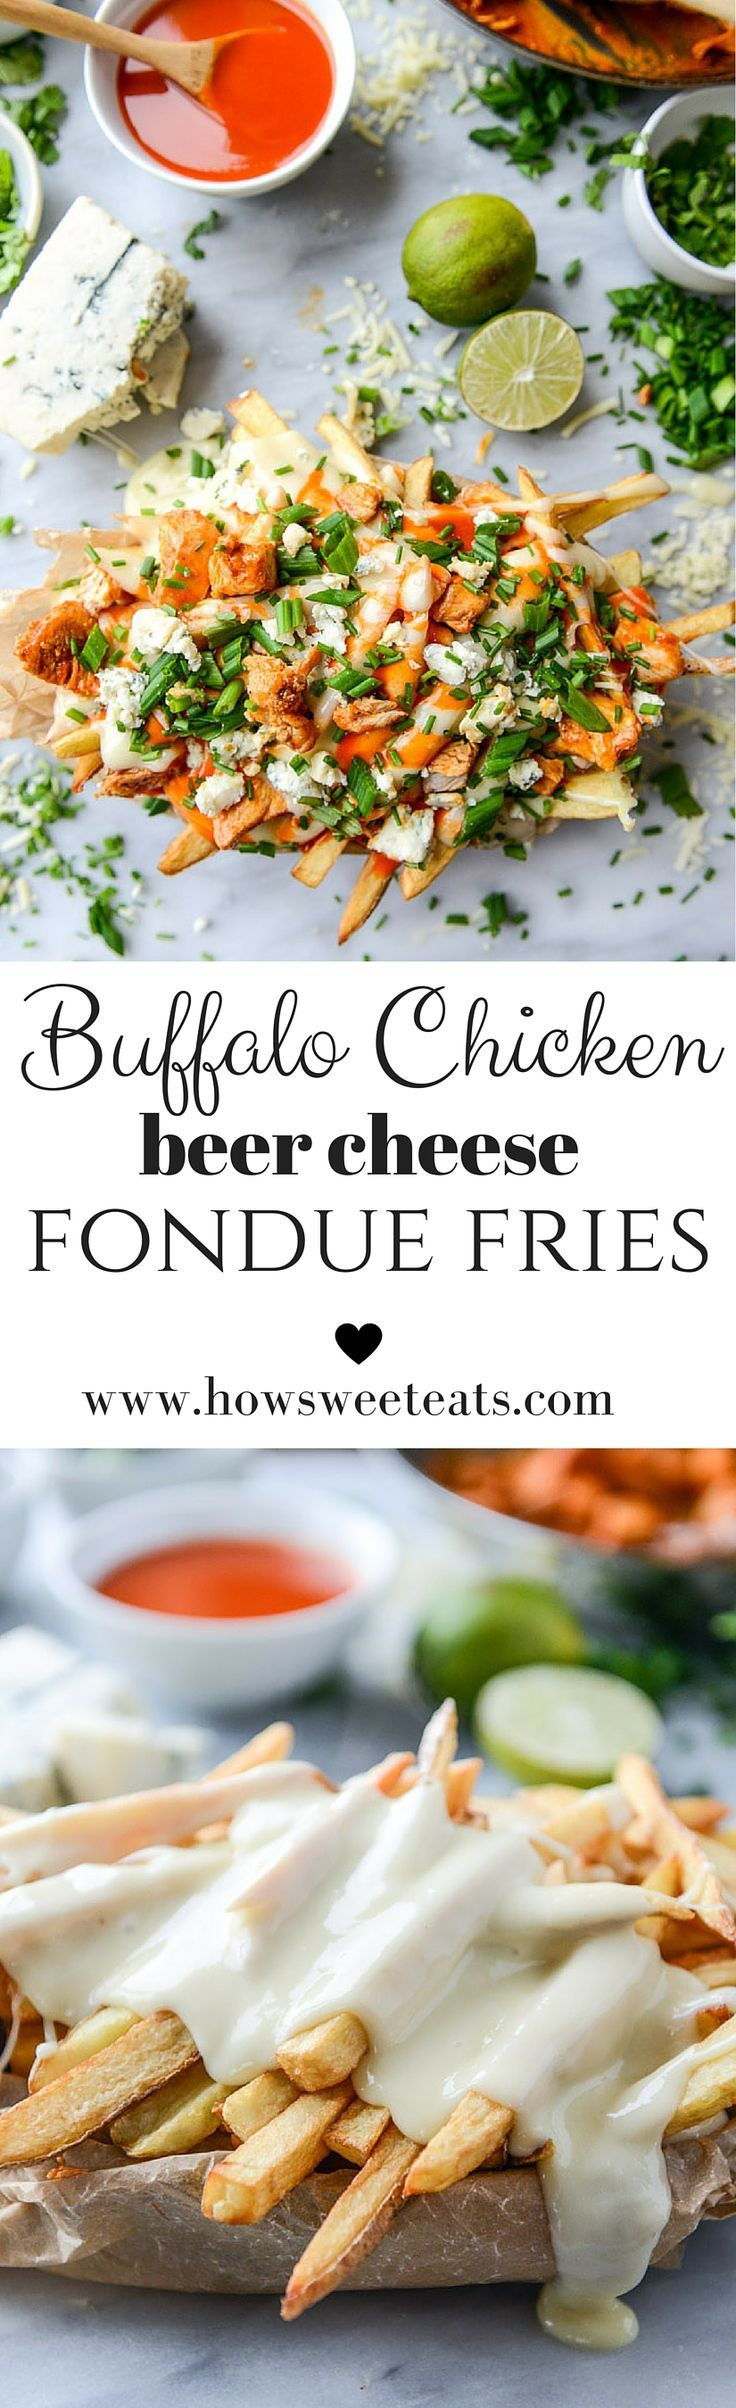 buffalo chicken beer cheese fondue fries I http://howsweeteats.com